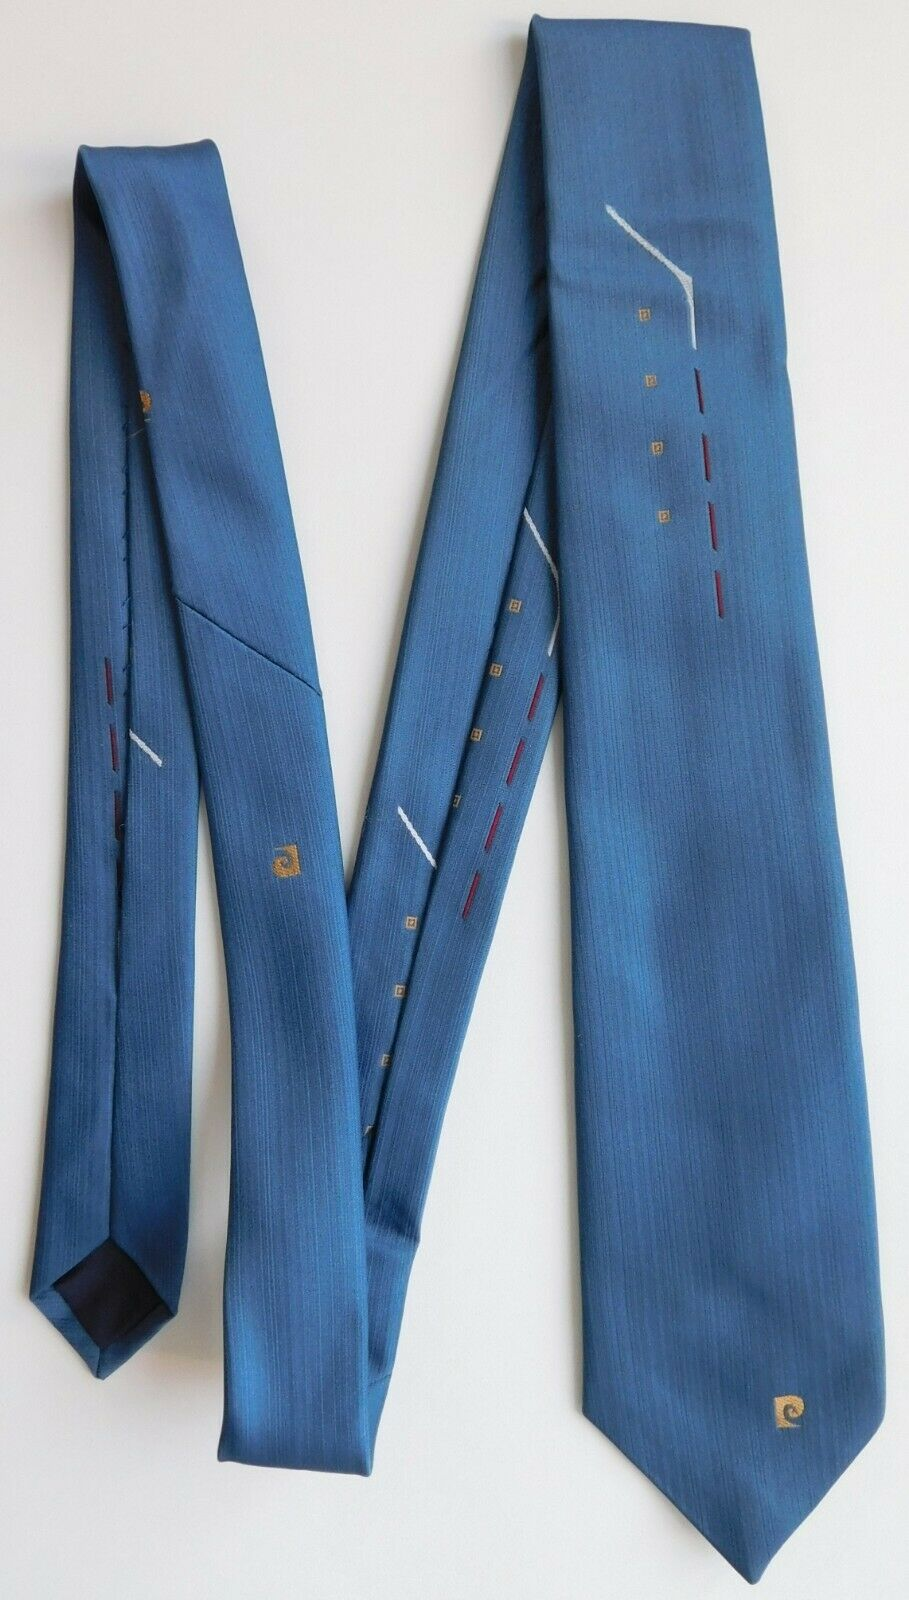 Vintage tie Pierre Cardin Paris British made 1960s 1970s mens accessories